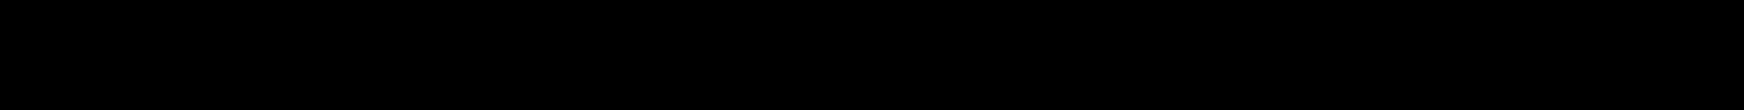 MetaPro-CondNorm.otf